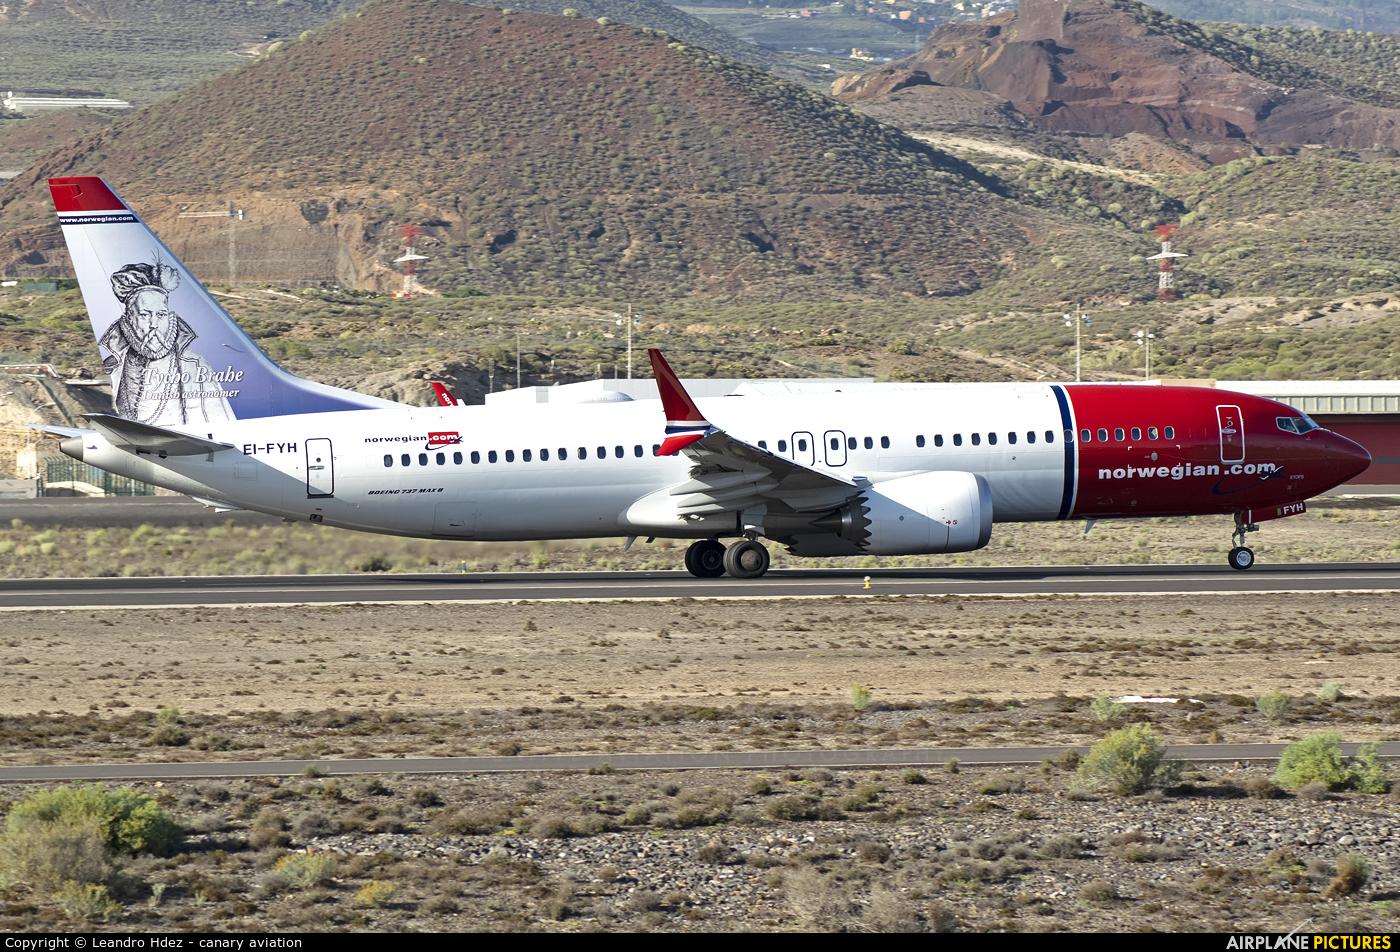 Norwegian Air Shuttle EI-FYH aircraft at Tenerife Sur - Reina Sofia